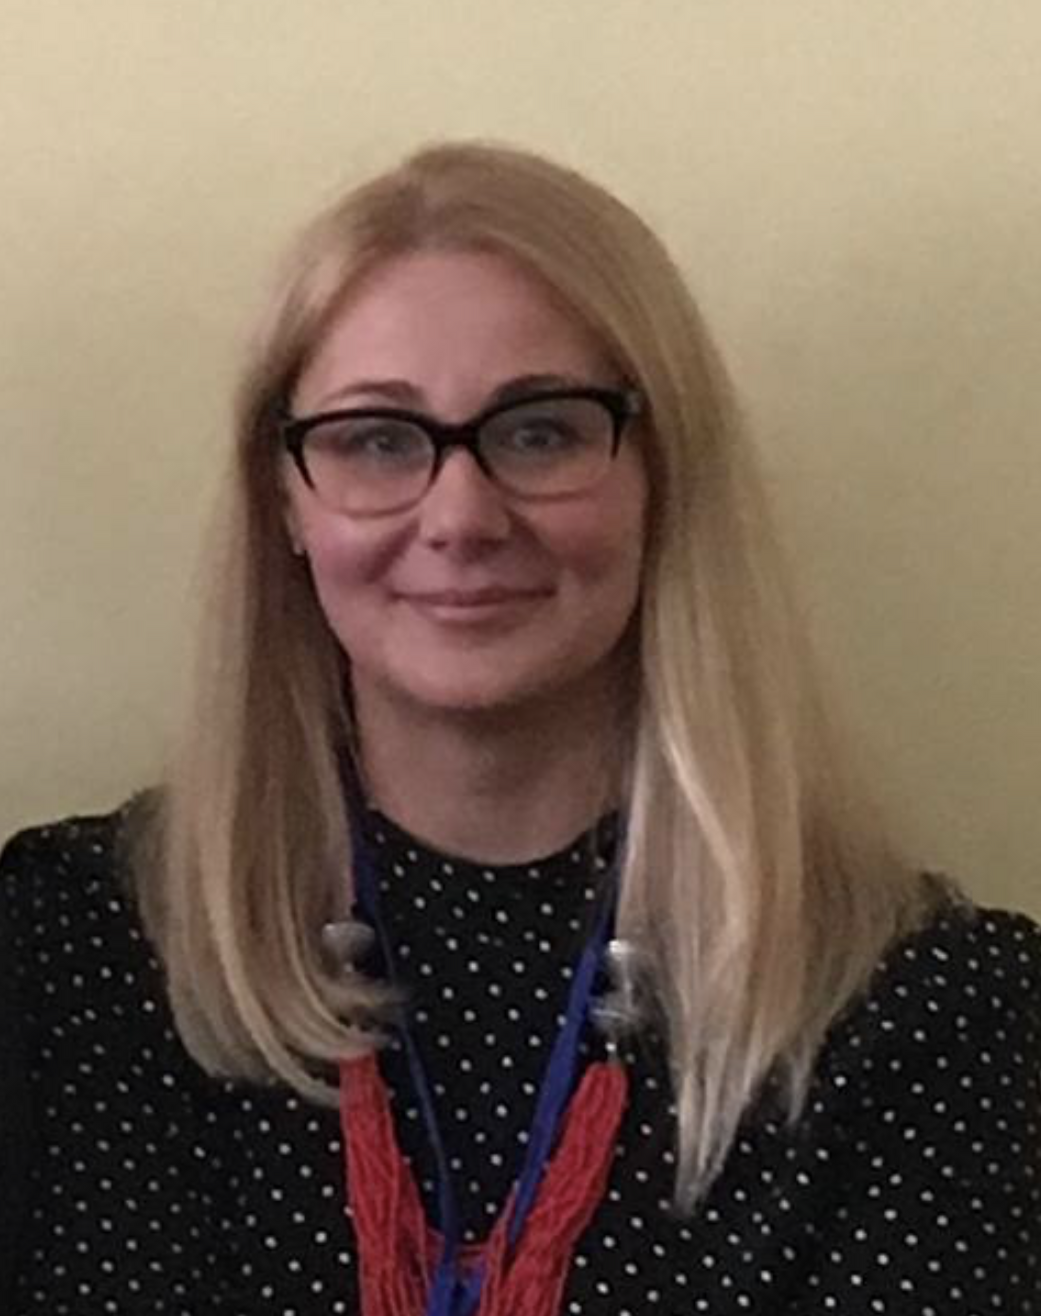 Olga Polotska